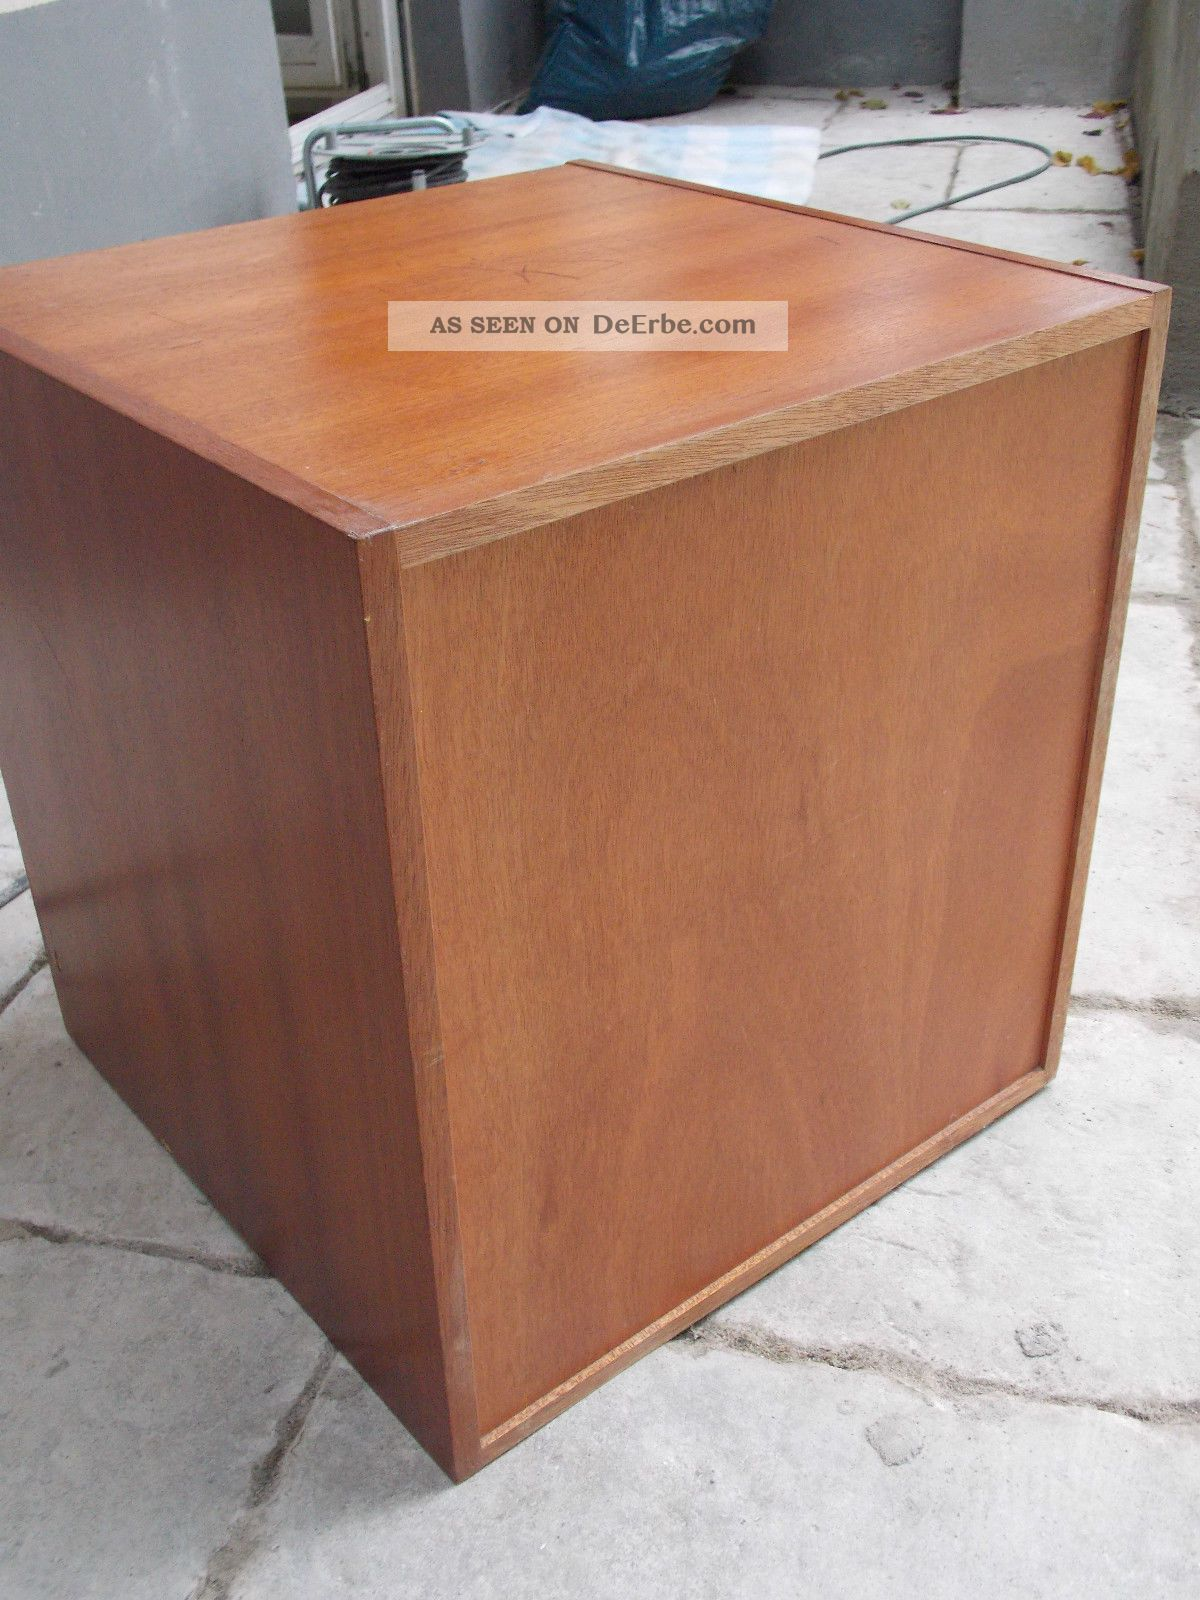 Bauhaus 40er 50er jahre kommode industriedesign m bel for Kommode industriedesign